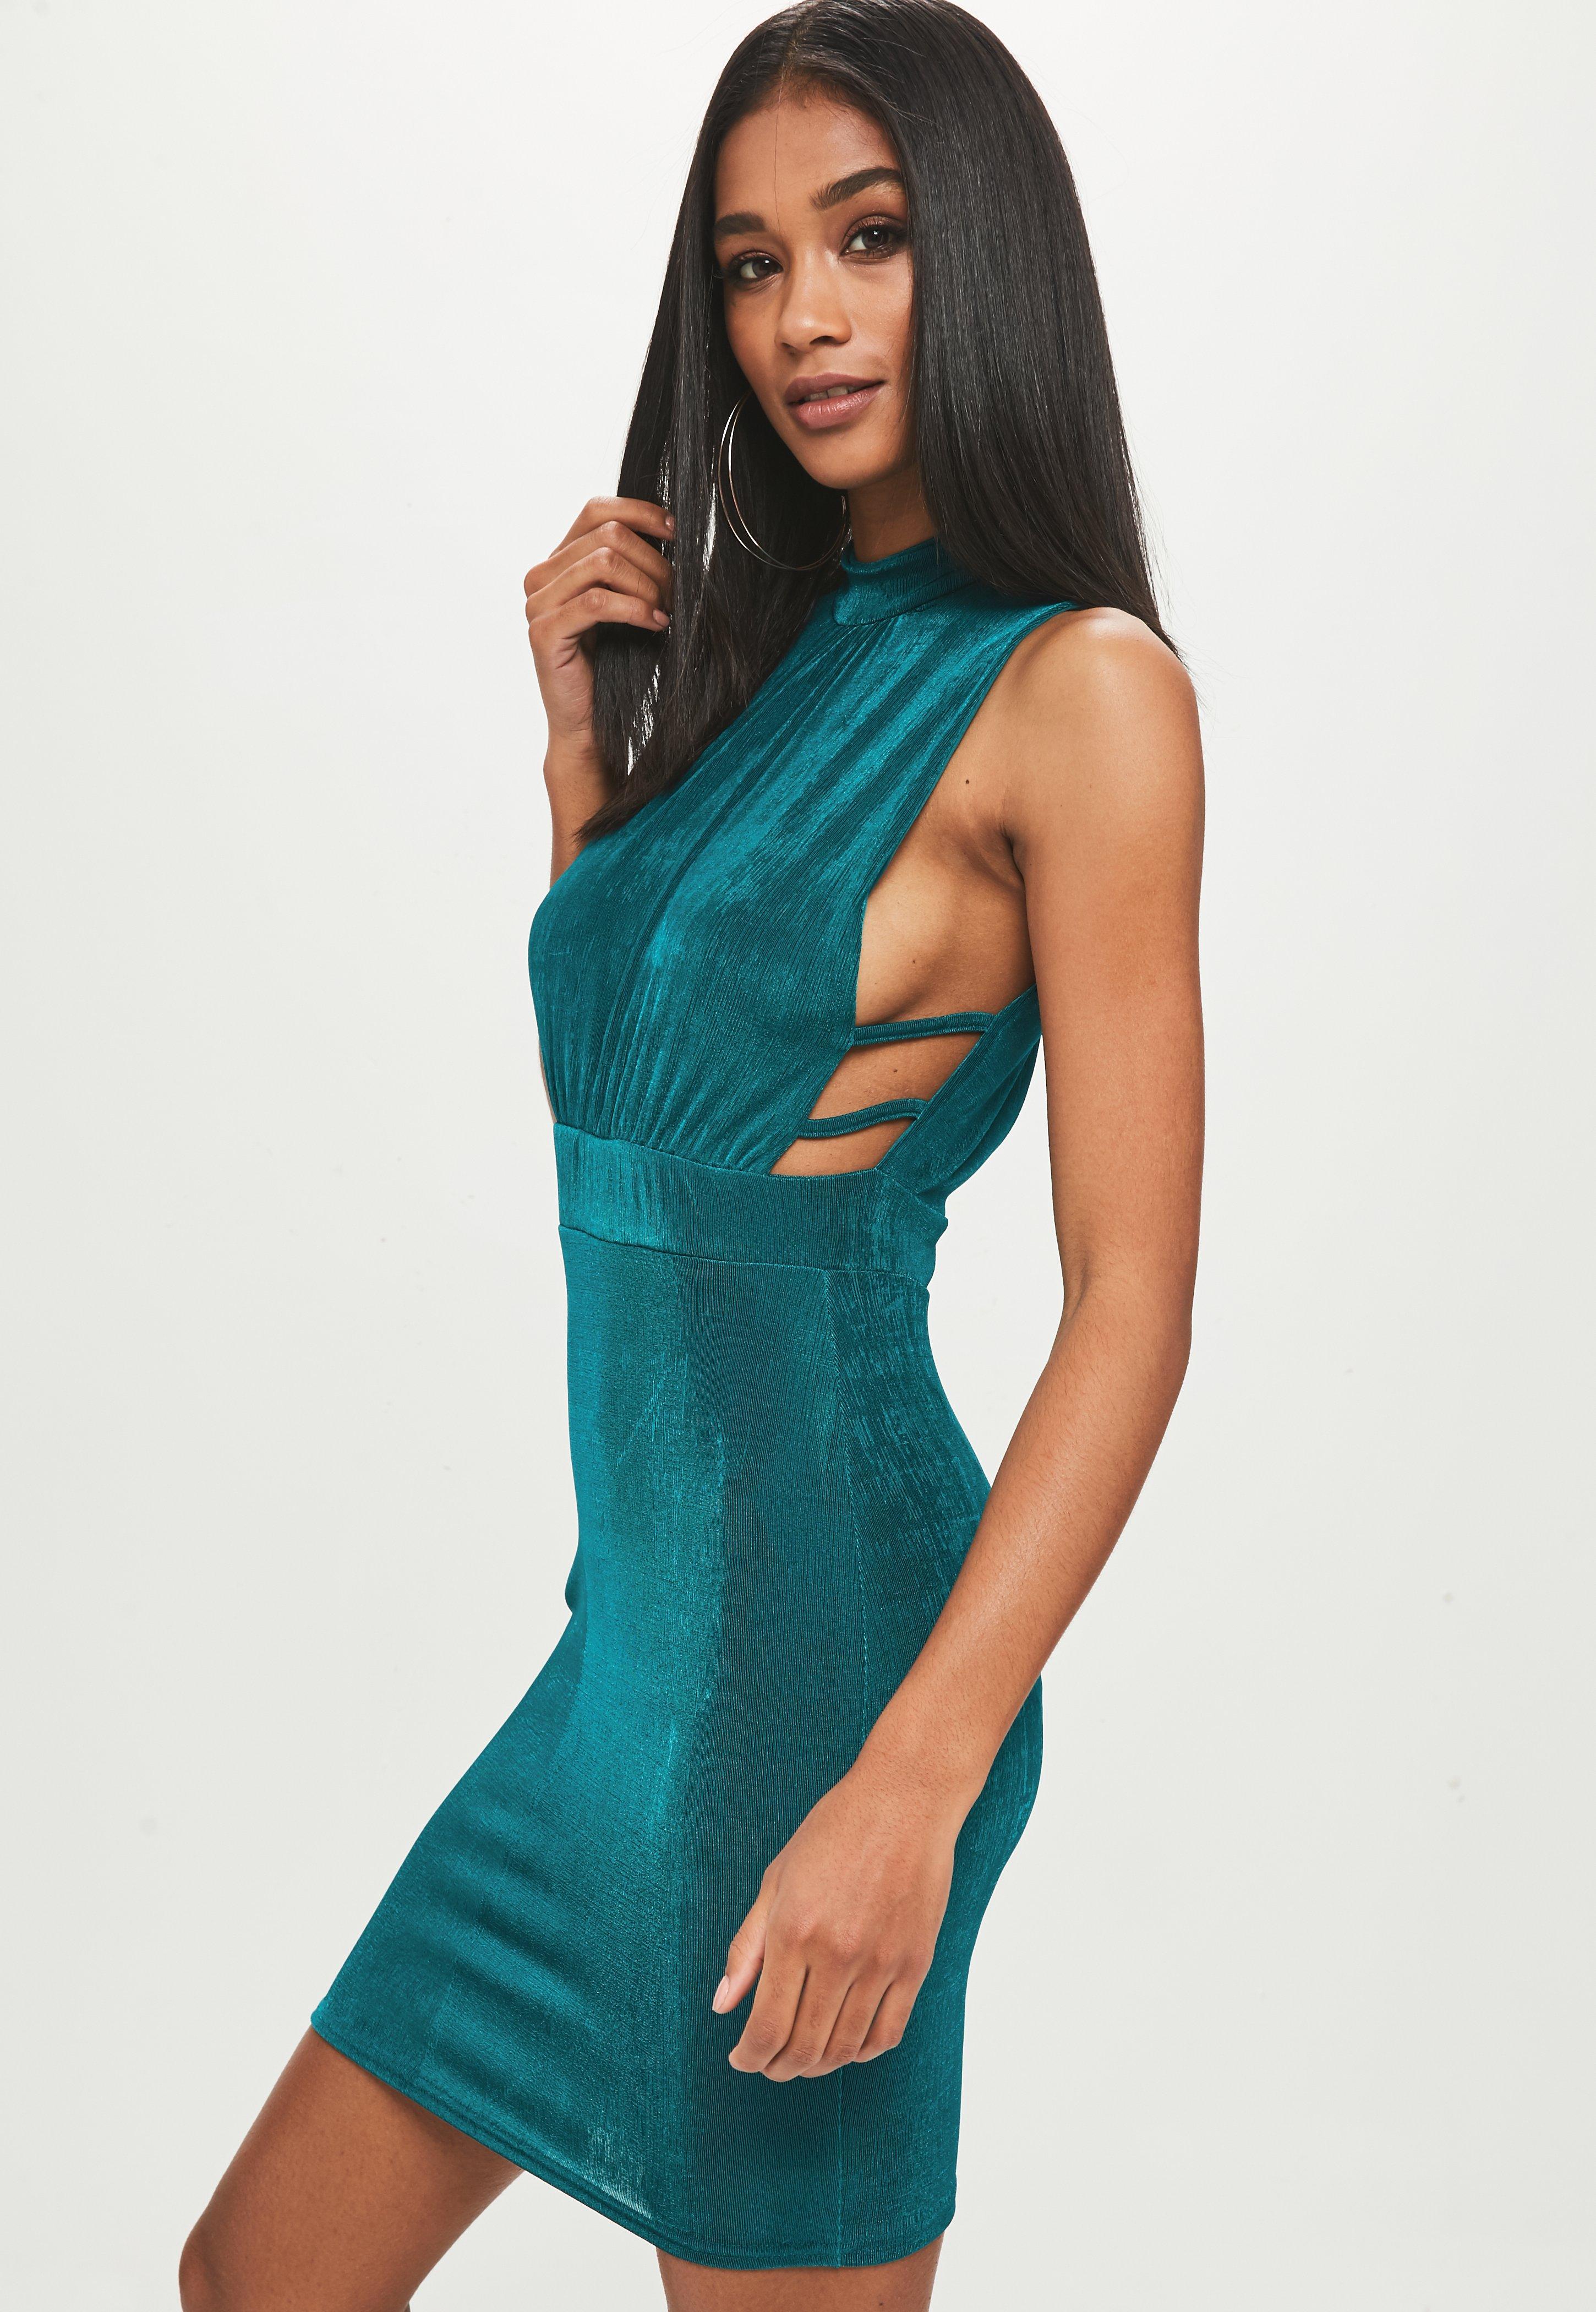 High Neck Dresses & Choker Neck Tops - Missguided